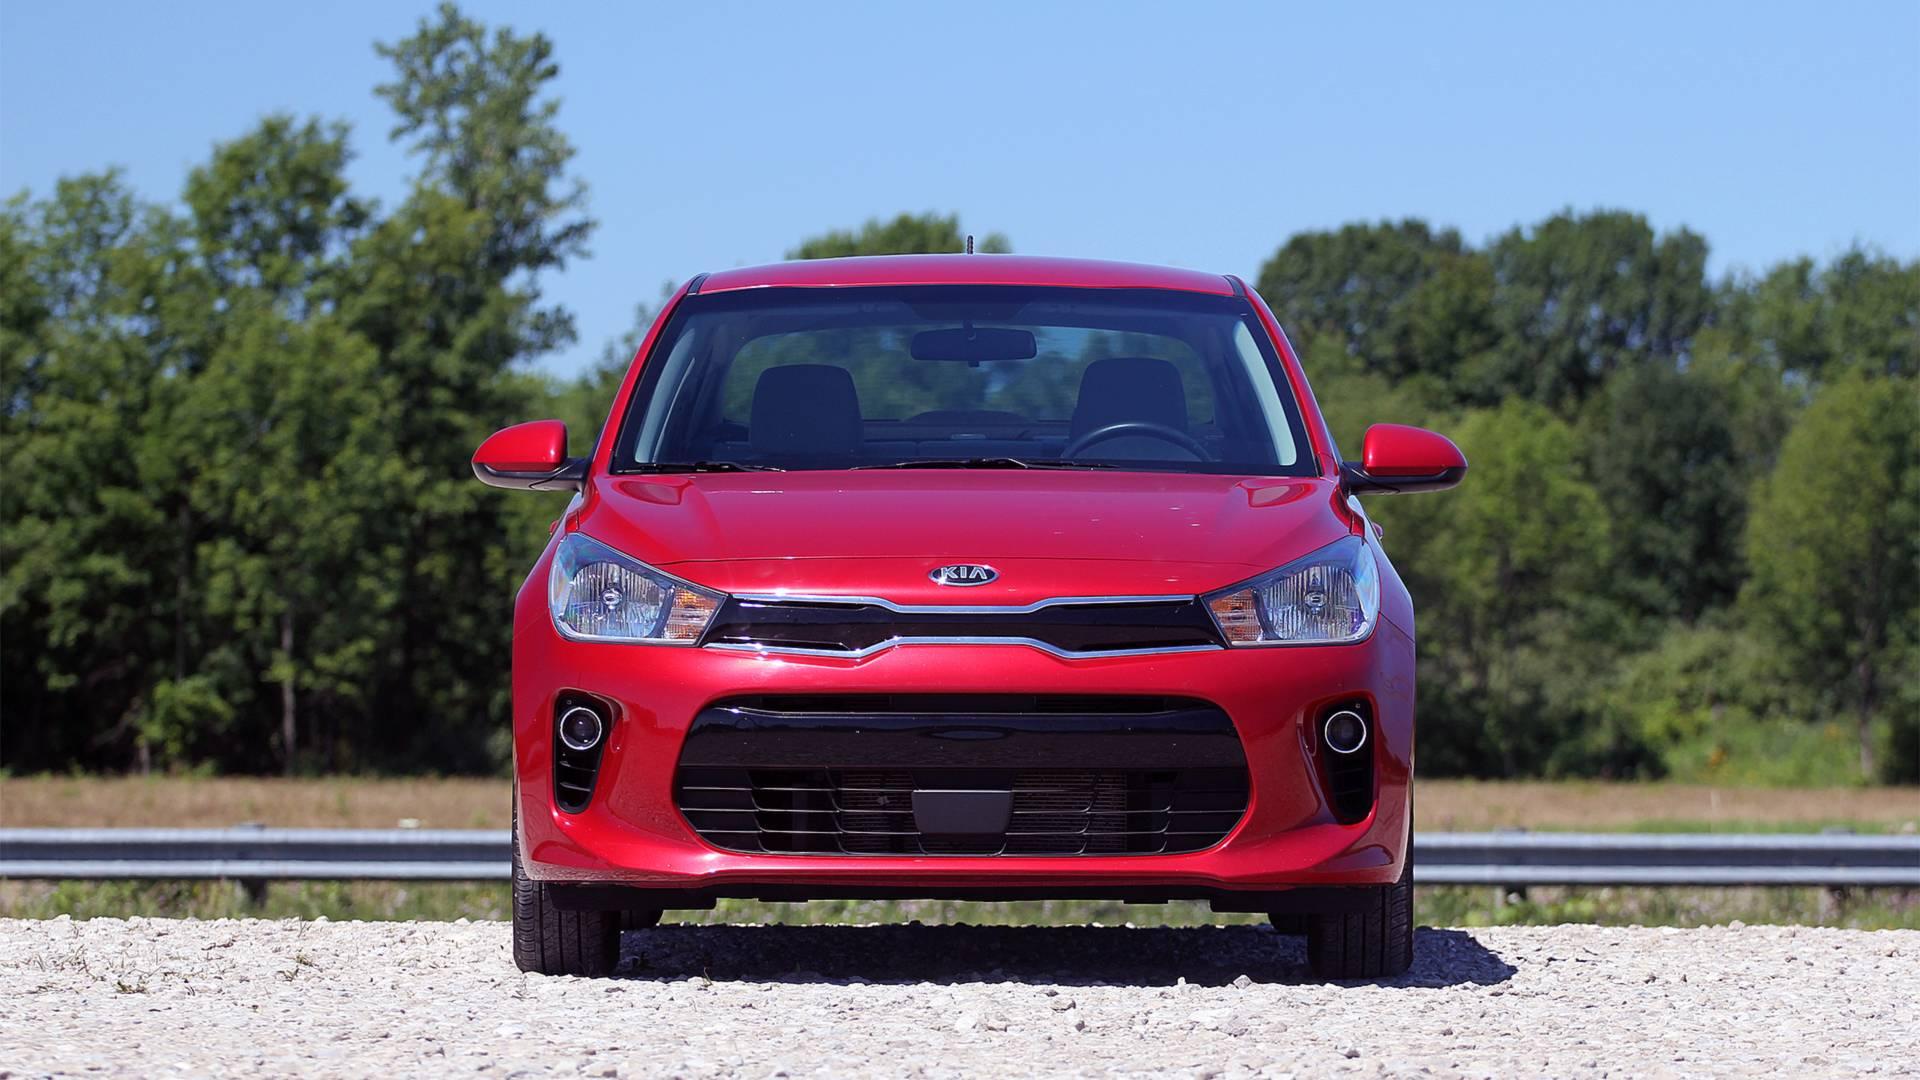 Kia Rio: owner reviews, car review, advantages and disadvantages 74